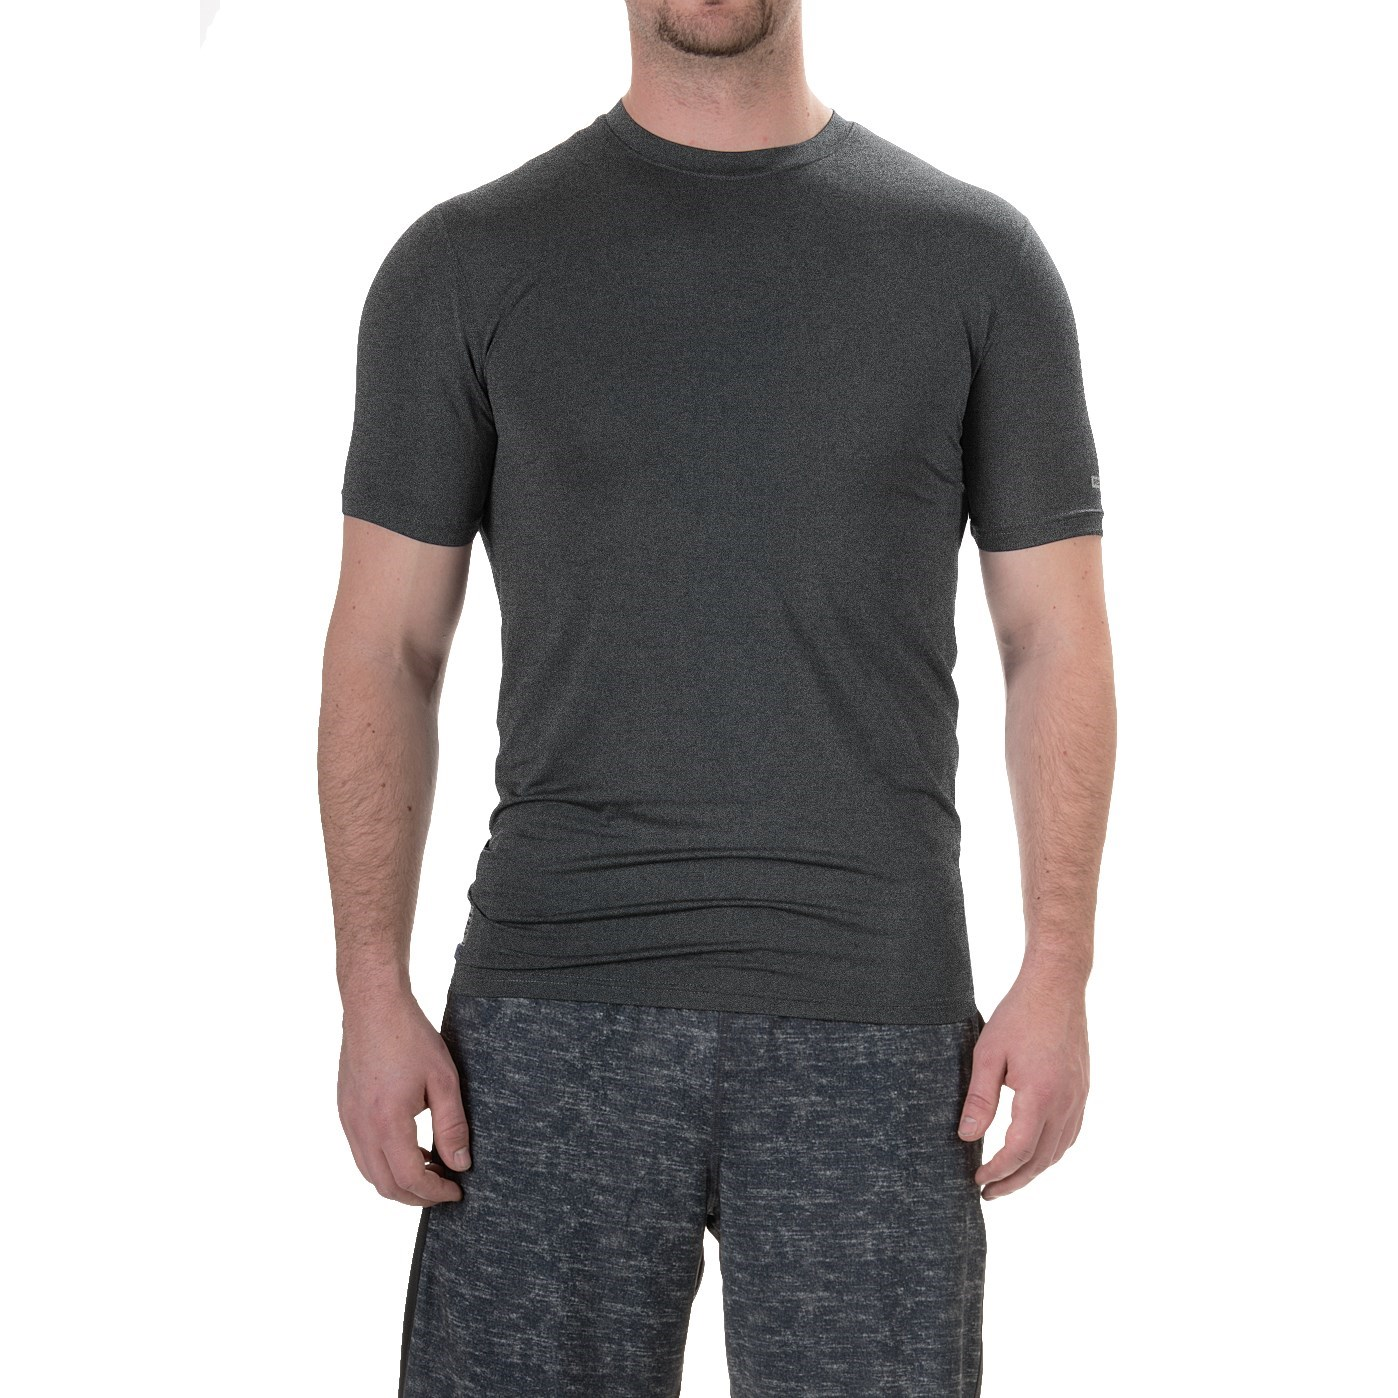 RBX XTrain Compression Shirt (For Men) - Save 65%